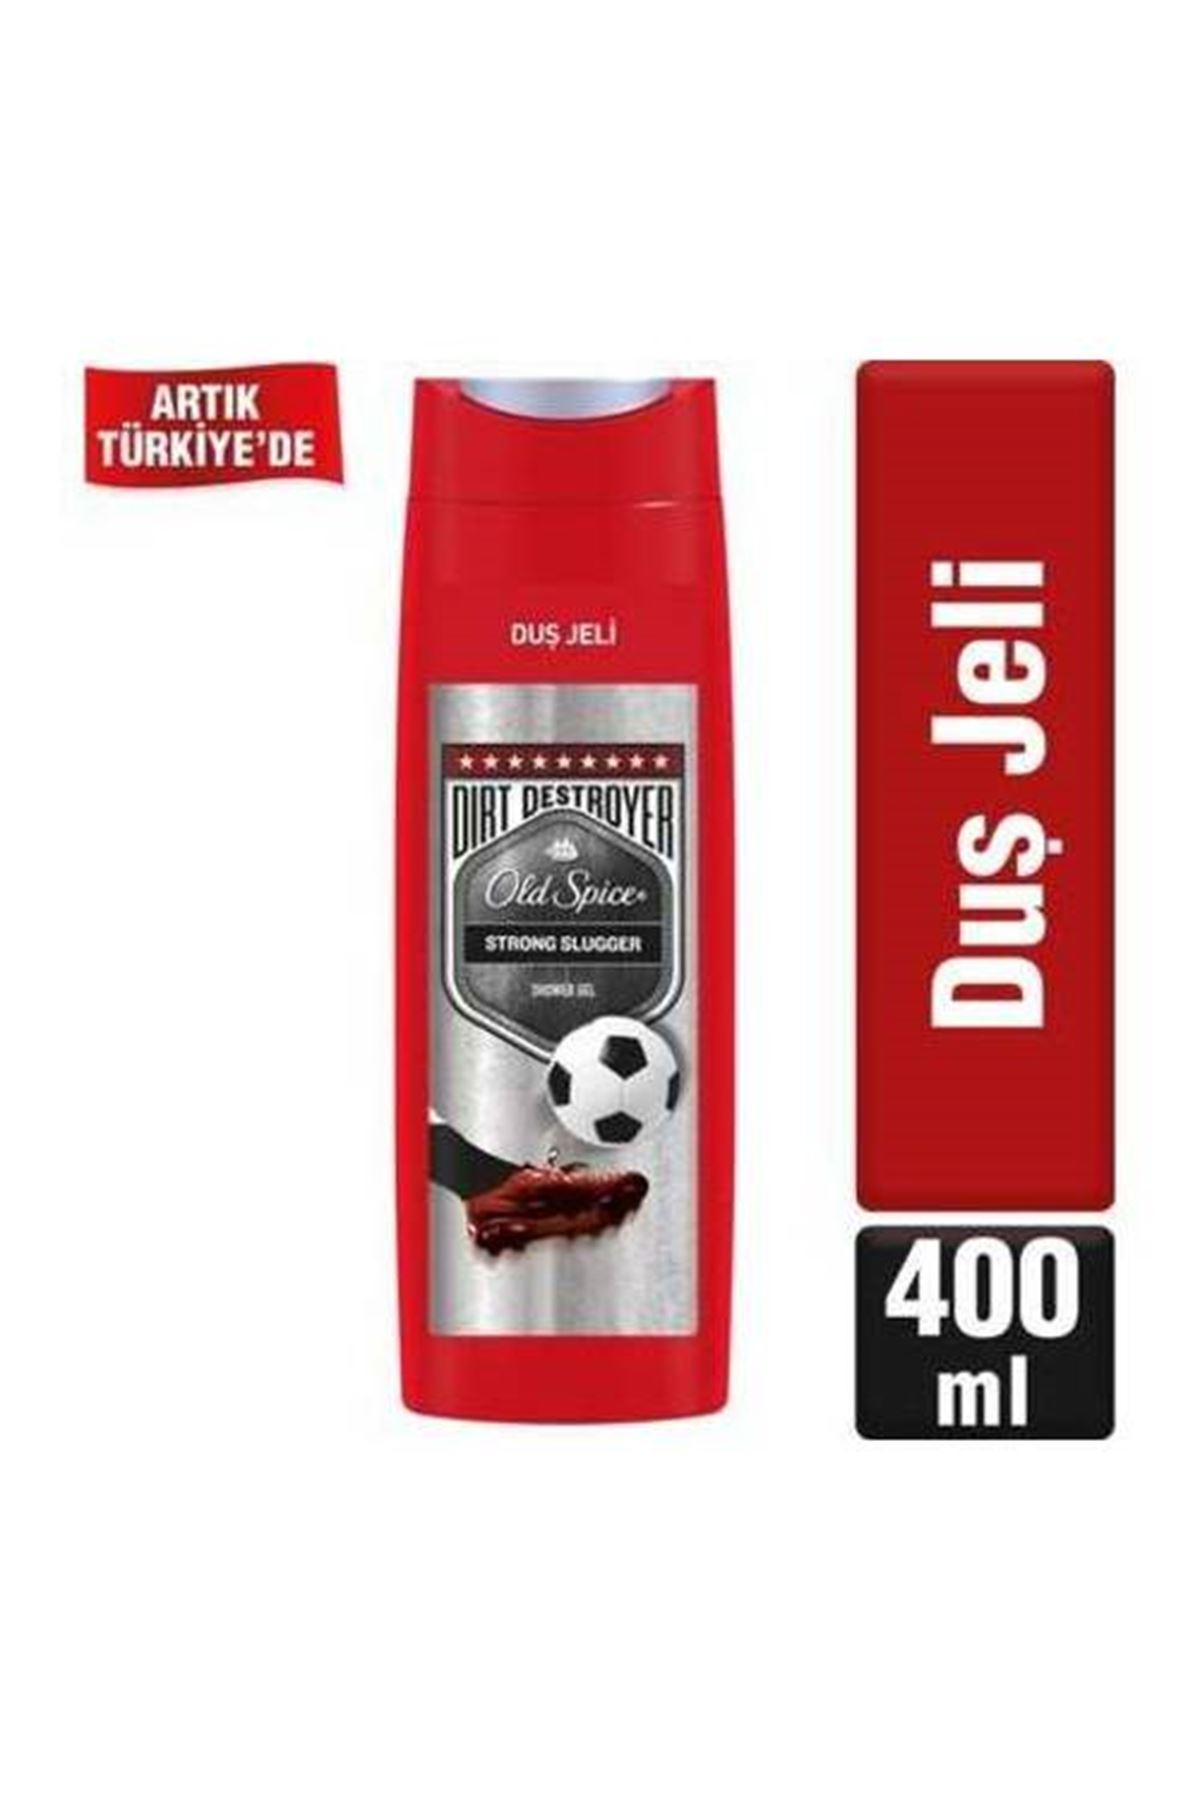 Old Spice Duş Jeli 400 ML Slugger